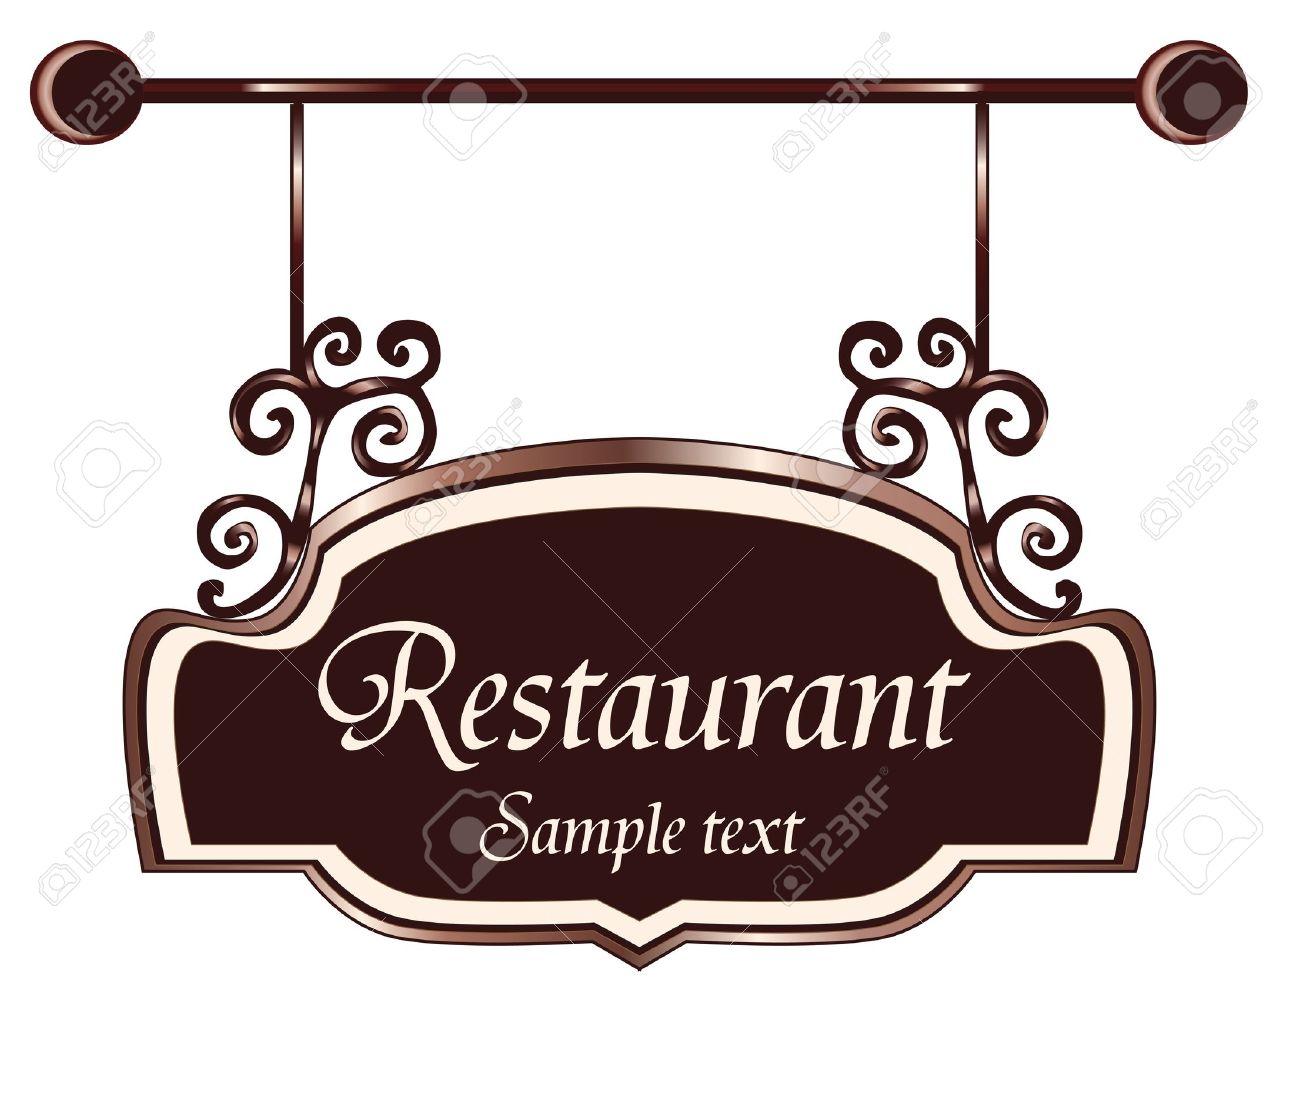 restaurant  sign Stock Vector - 19080411